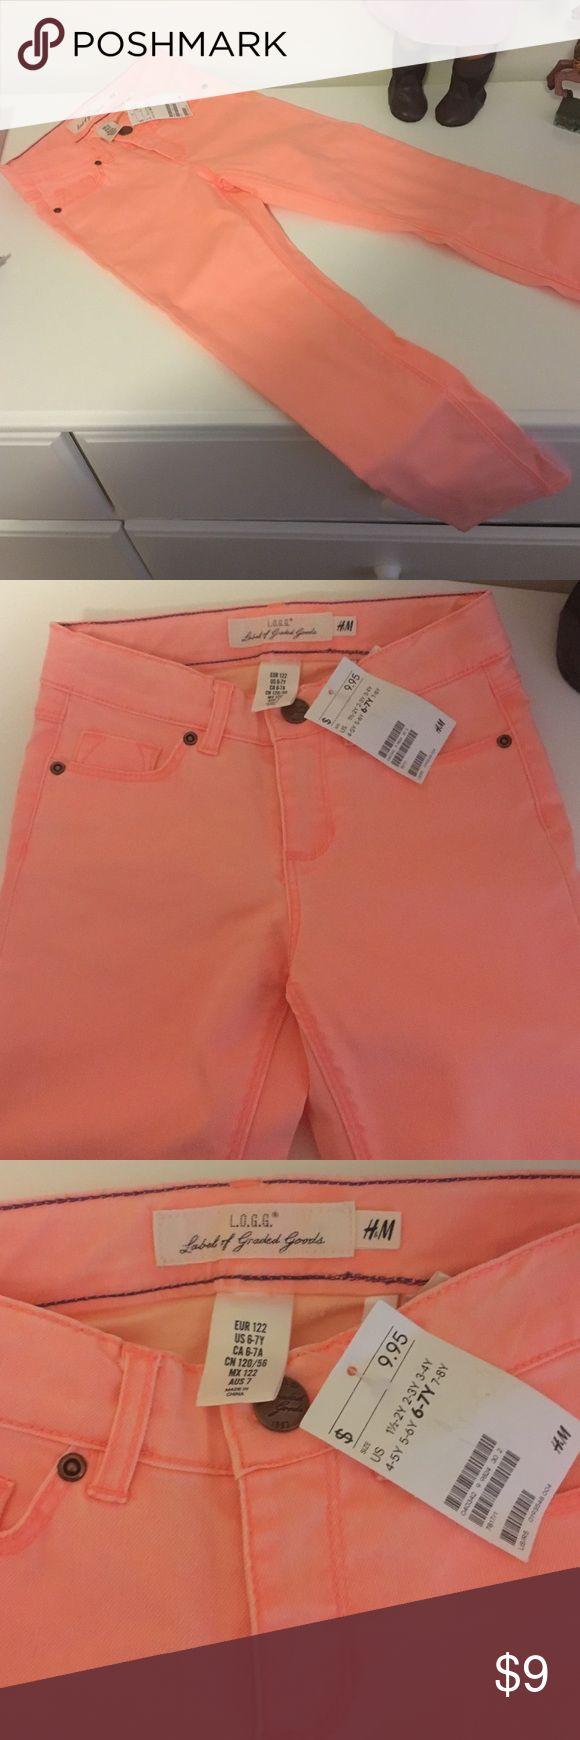 H&M New Peach Skinny Jeans - girls H&M New Peach Skinny Jeans - girls H&M Bottoms Jeans